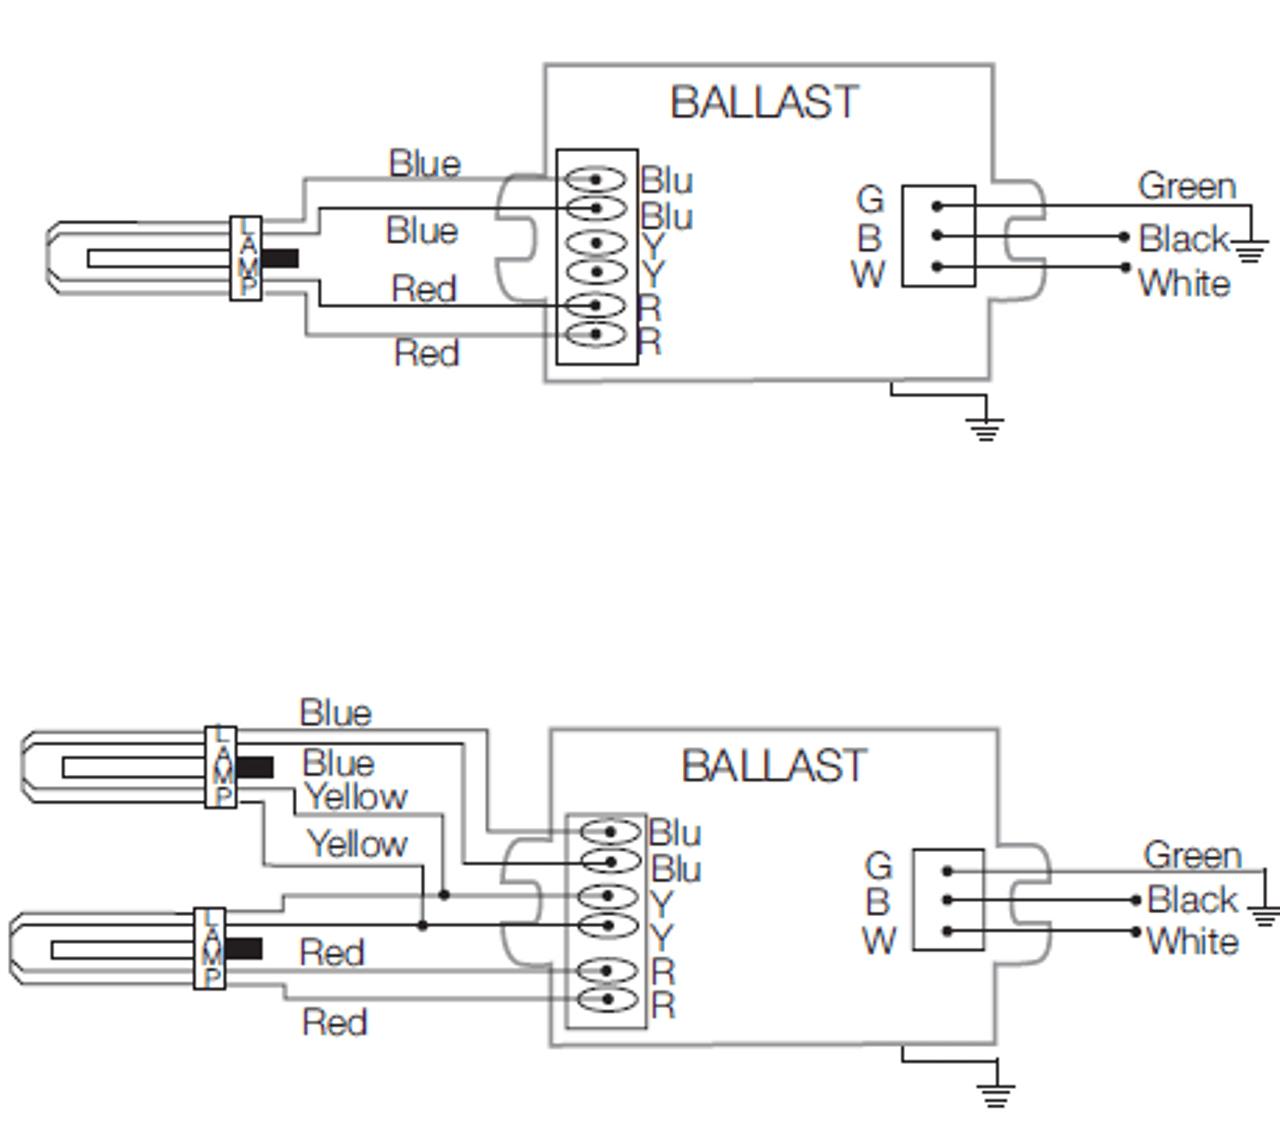 medium resolution of sylvania ballast wiring diagram guide about wiring diagram osram sylvania ballast wiring diagram